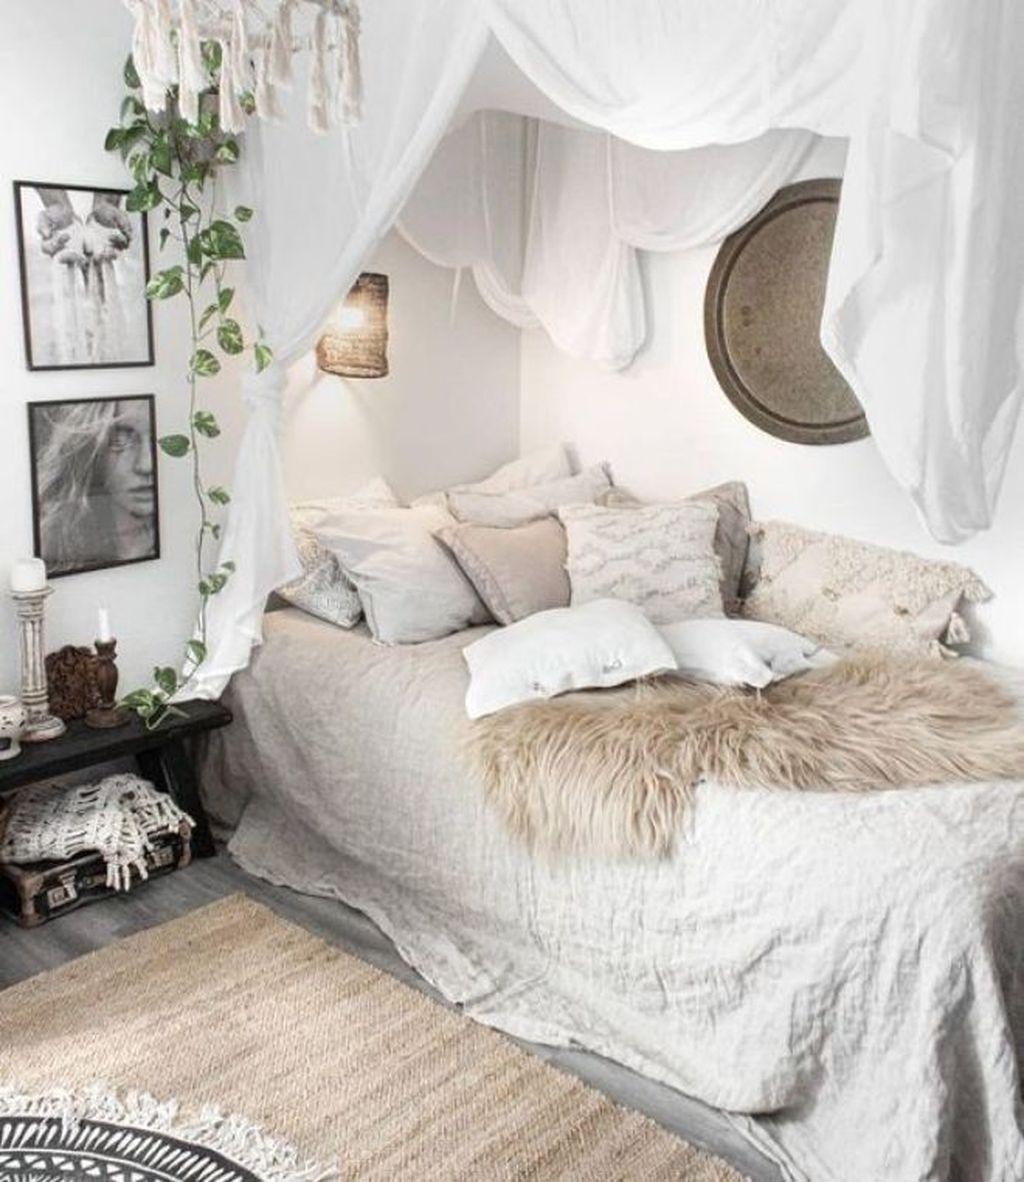 Awesome Boho Chic Bedroom Decor Ideas 18